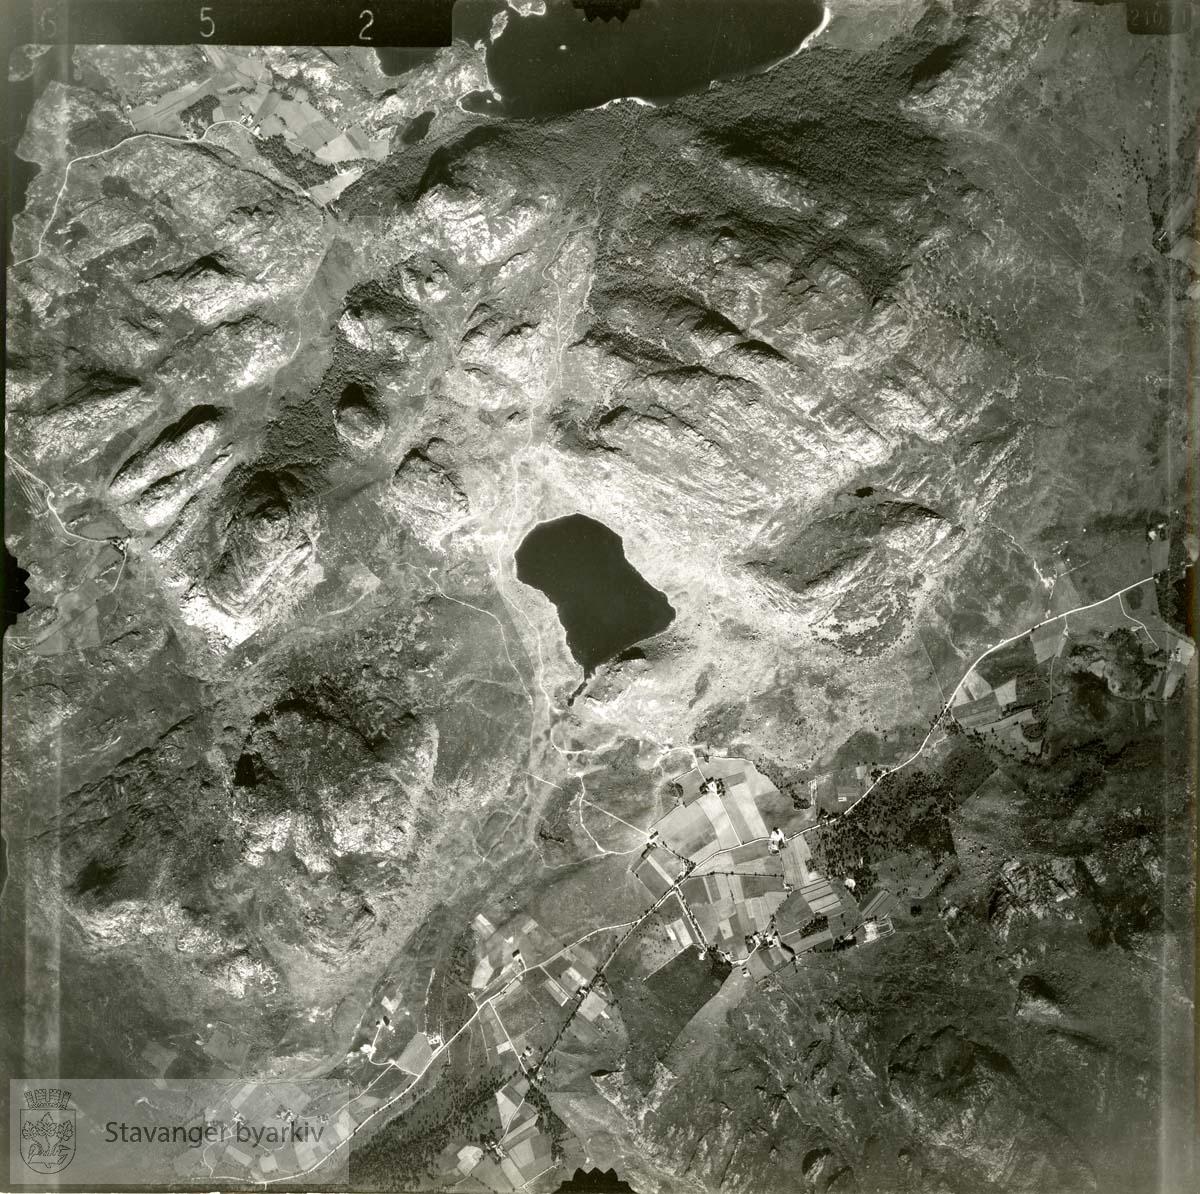 Jfr. kart/fotoplan I13/652..Duelifjellet, Nordlandstjørna, Dormelinuten, Storavatnet..Se ByStW_Uca_002 (kan lastes ned under fanen for kart på Stavangerbilder)